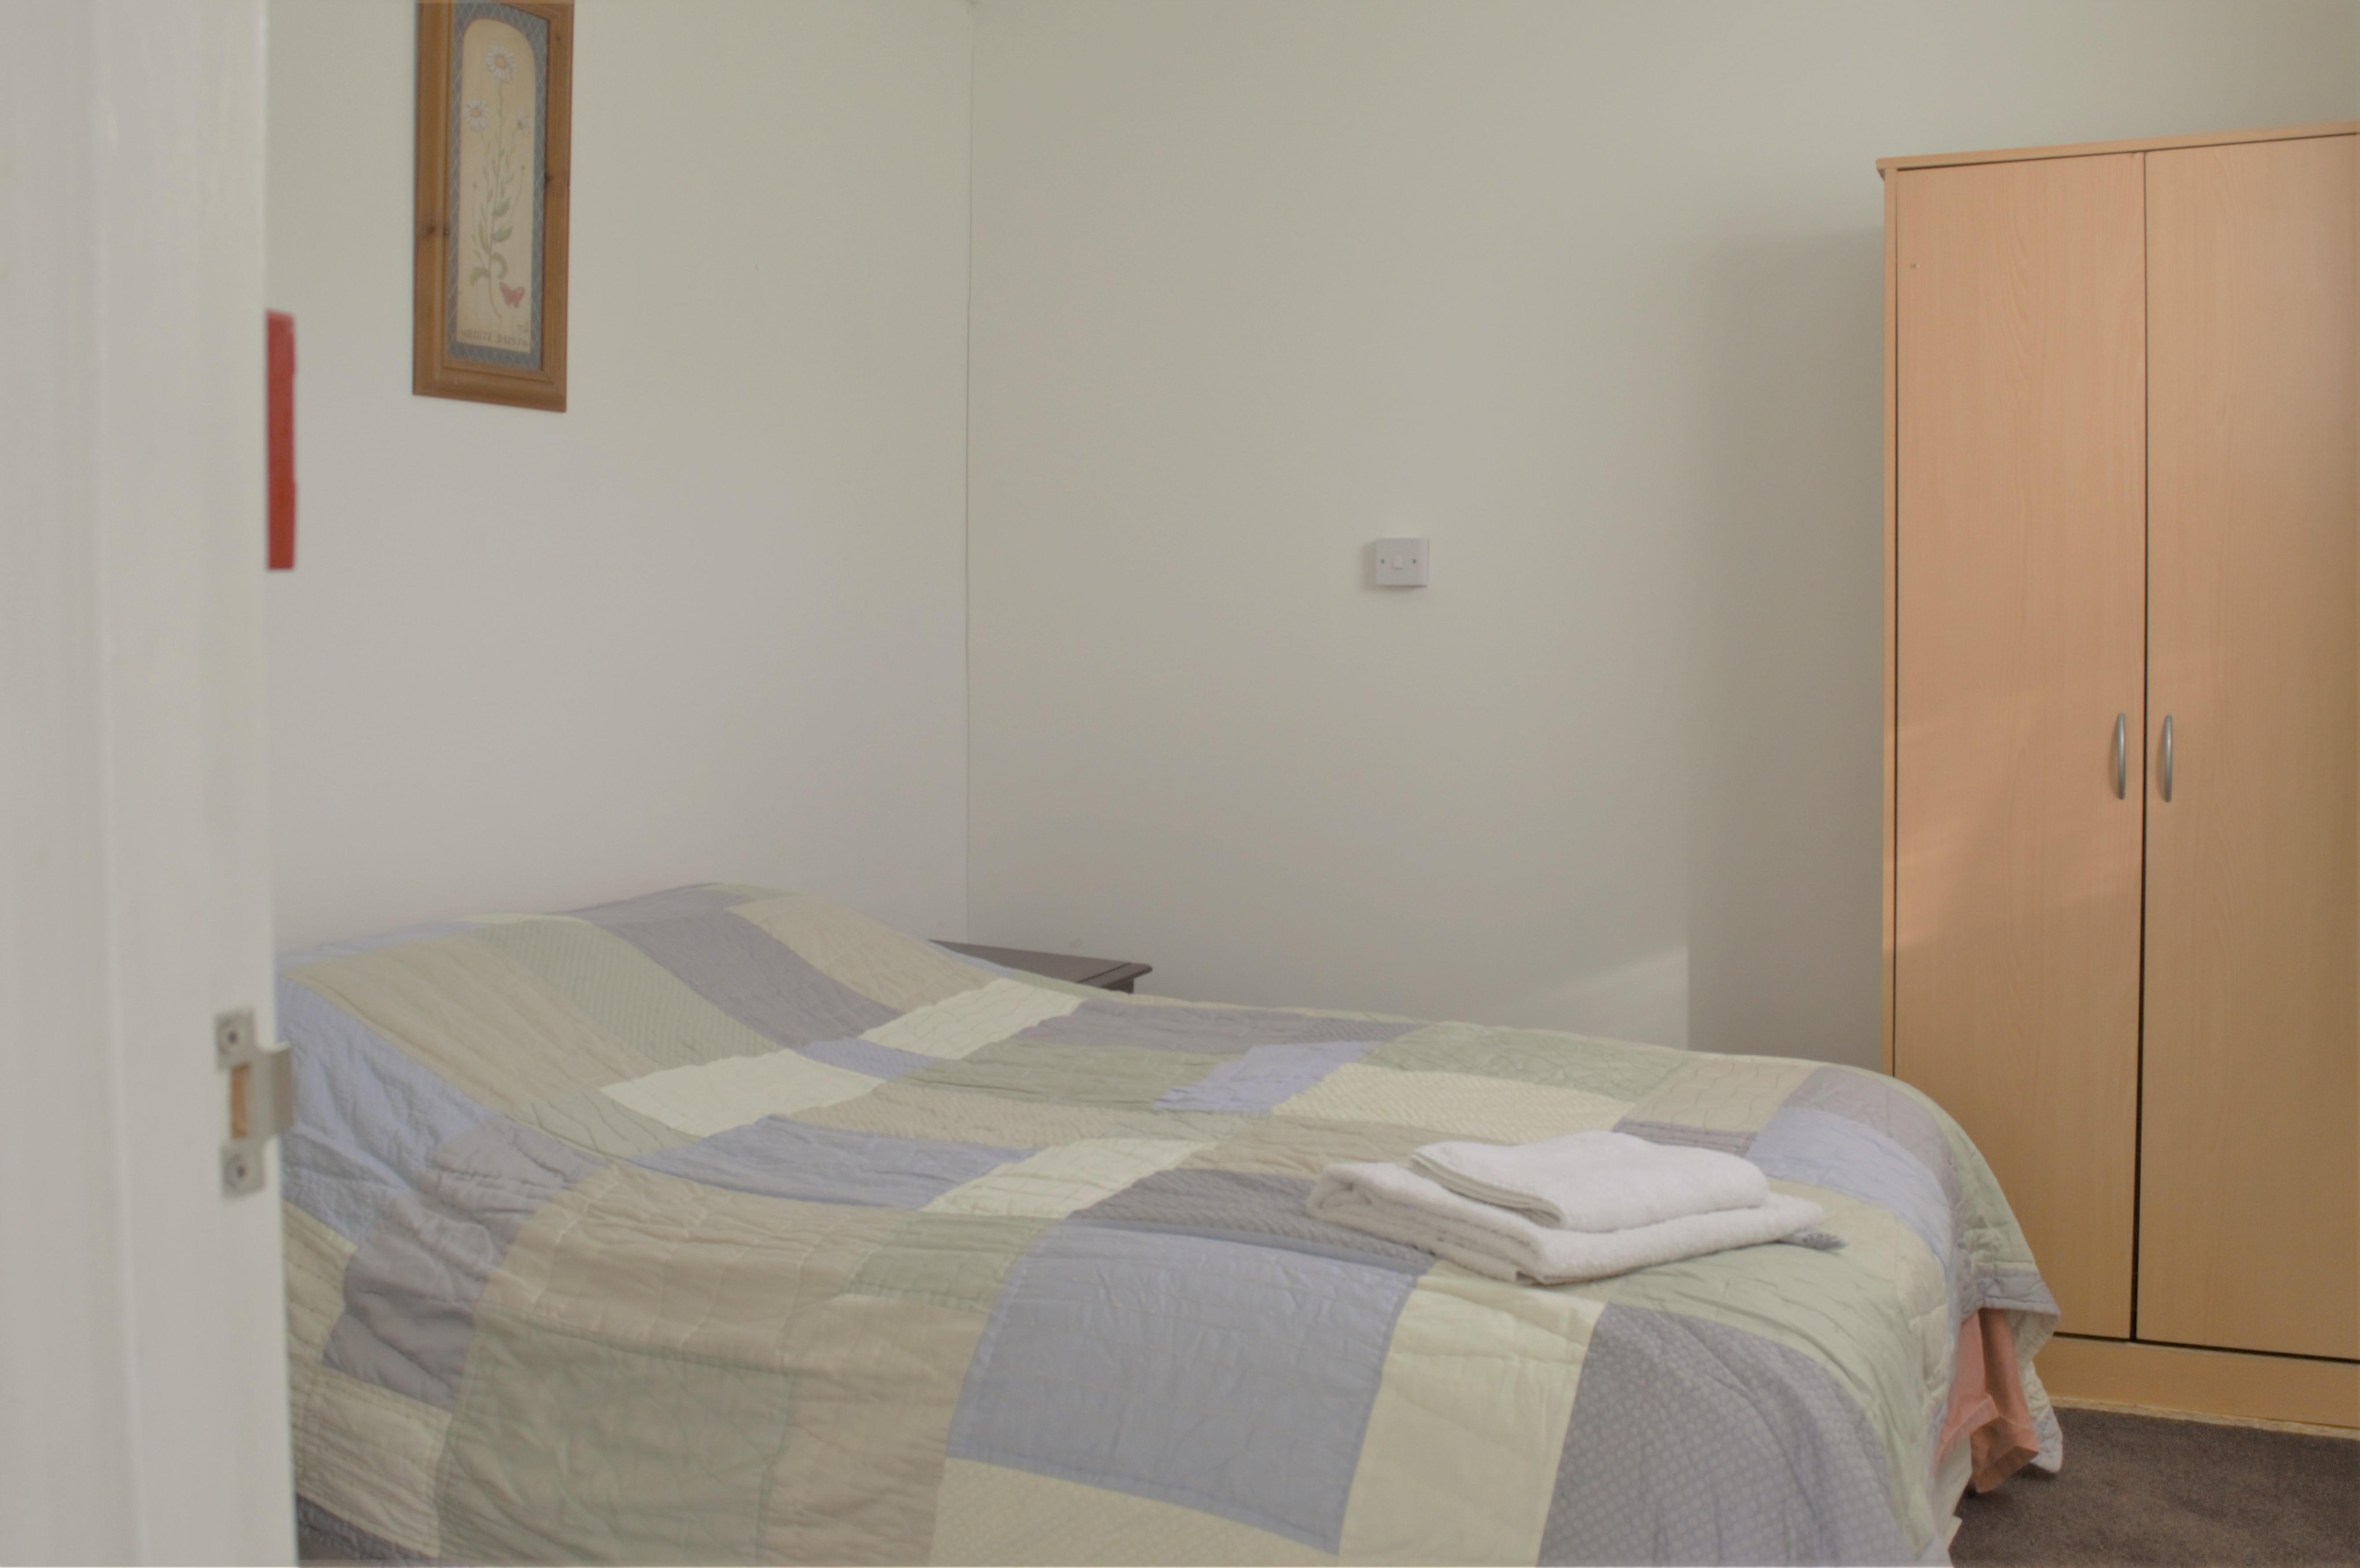 Apartment 29 - Bedroom